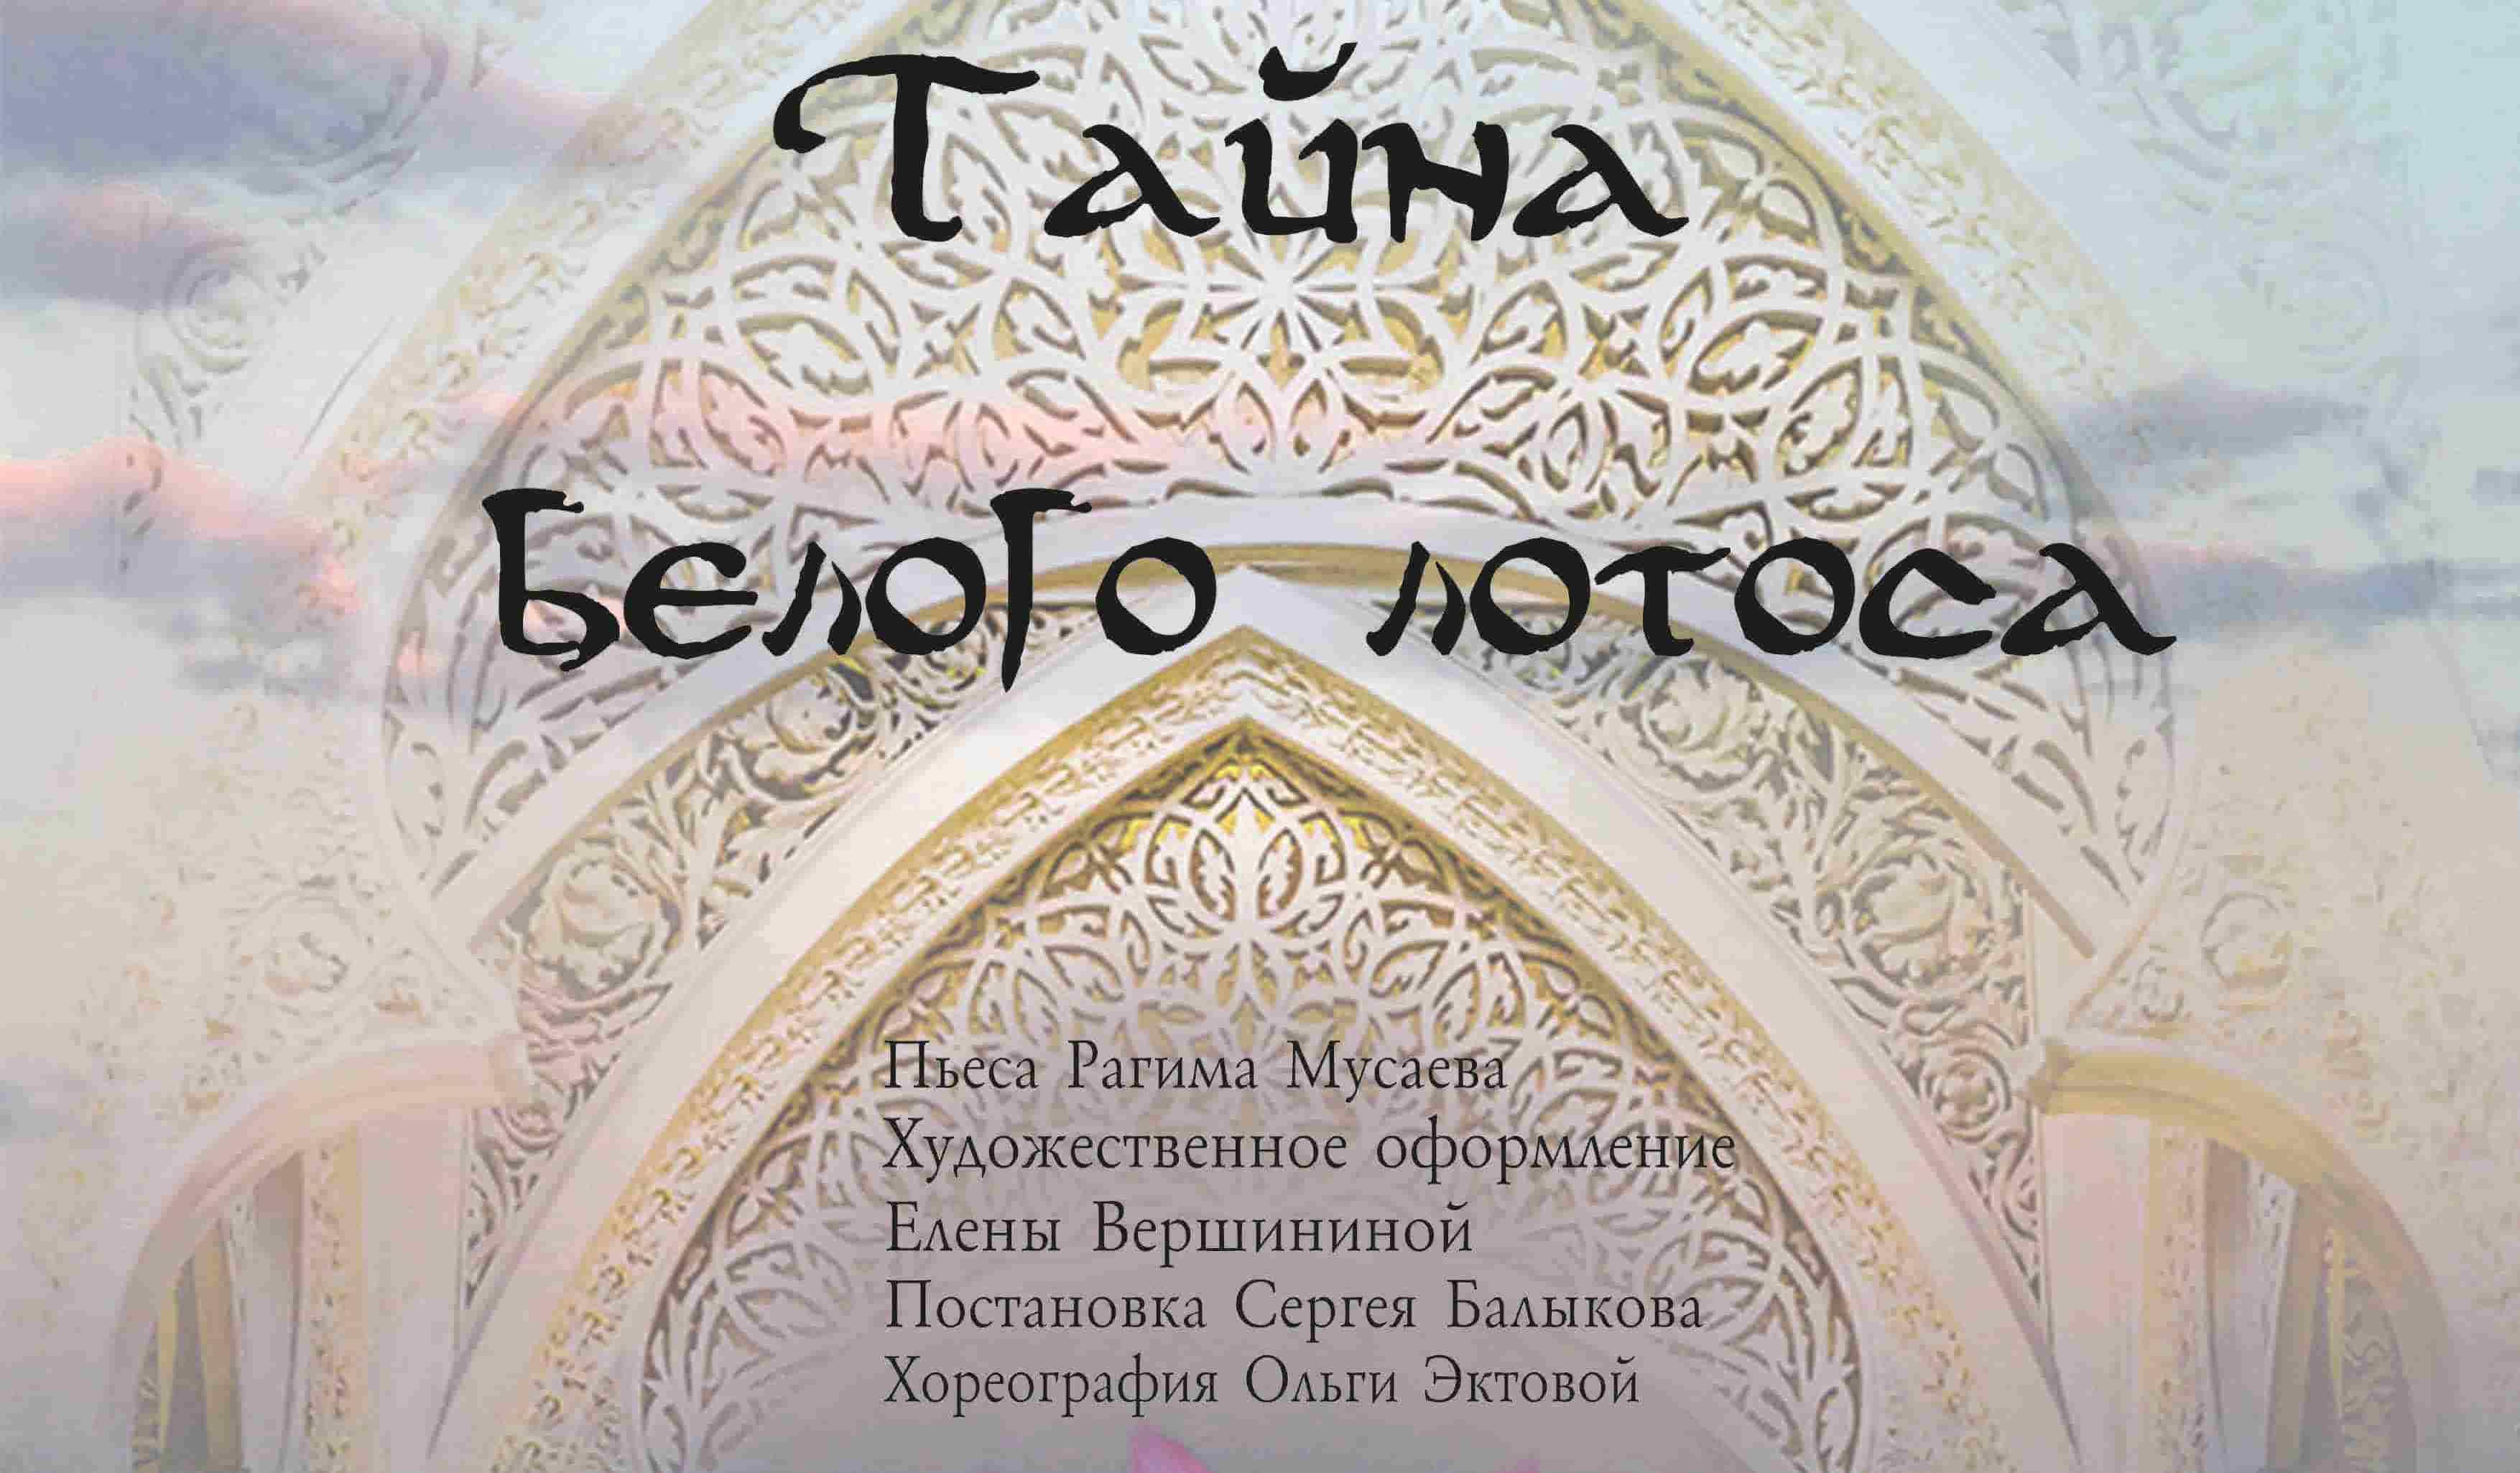 afisha_taina_belogo_lotosa_752